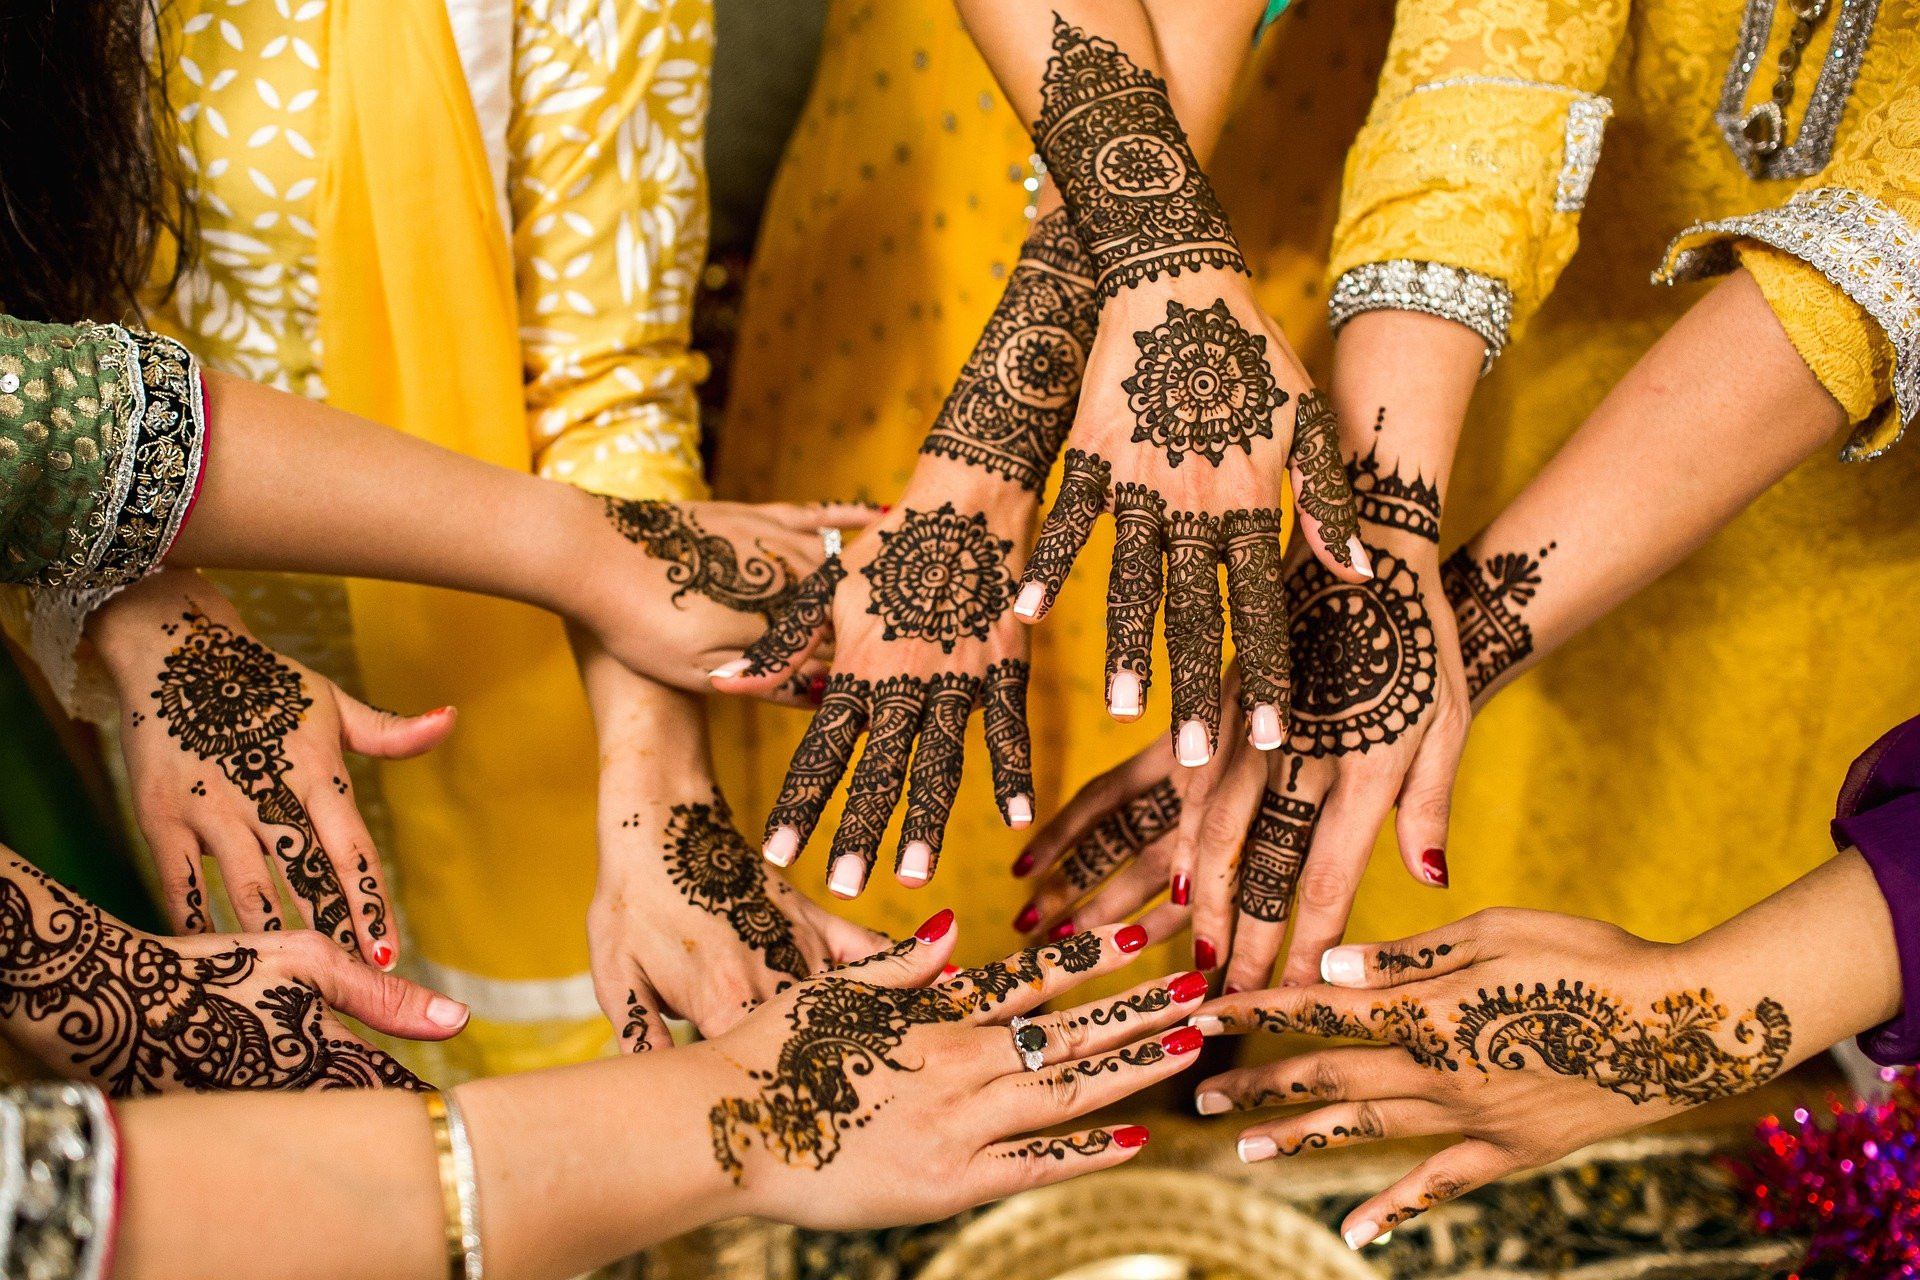 Ingin Henna Tahan Lama di Kulit, Ini 5 Tipsnya - JPNN.com